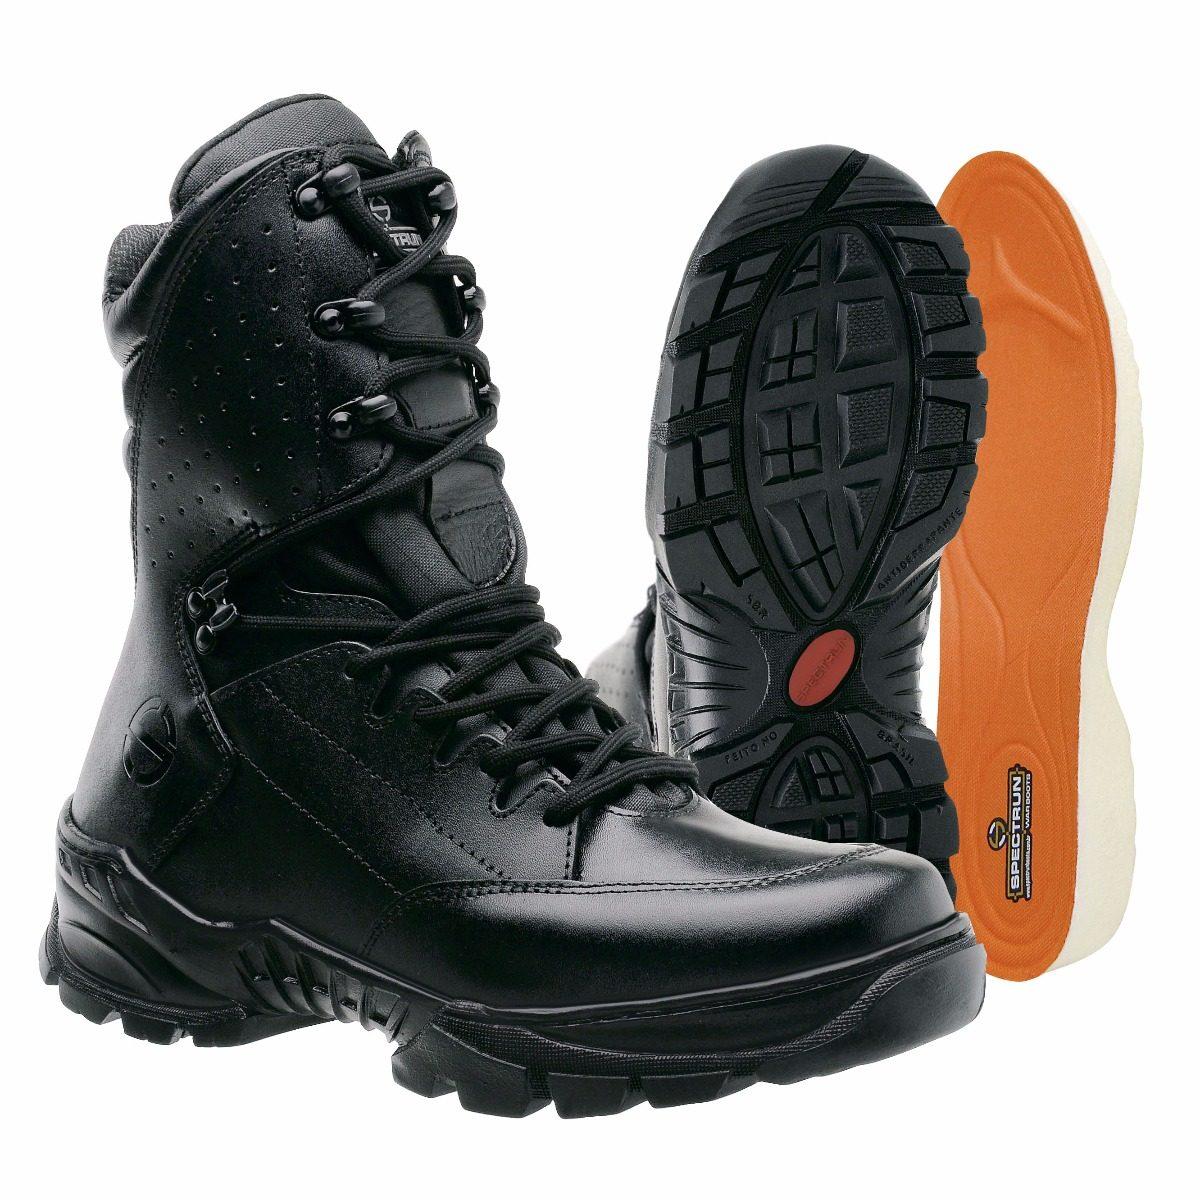 28bf2fff824 coturno bota militar tática airsoft policial spectrun boots. Carregando zoom .